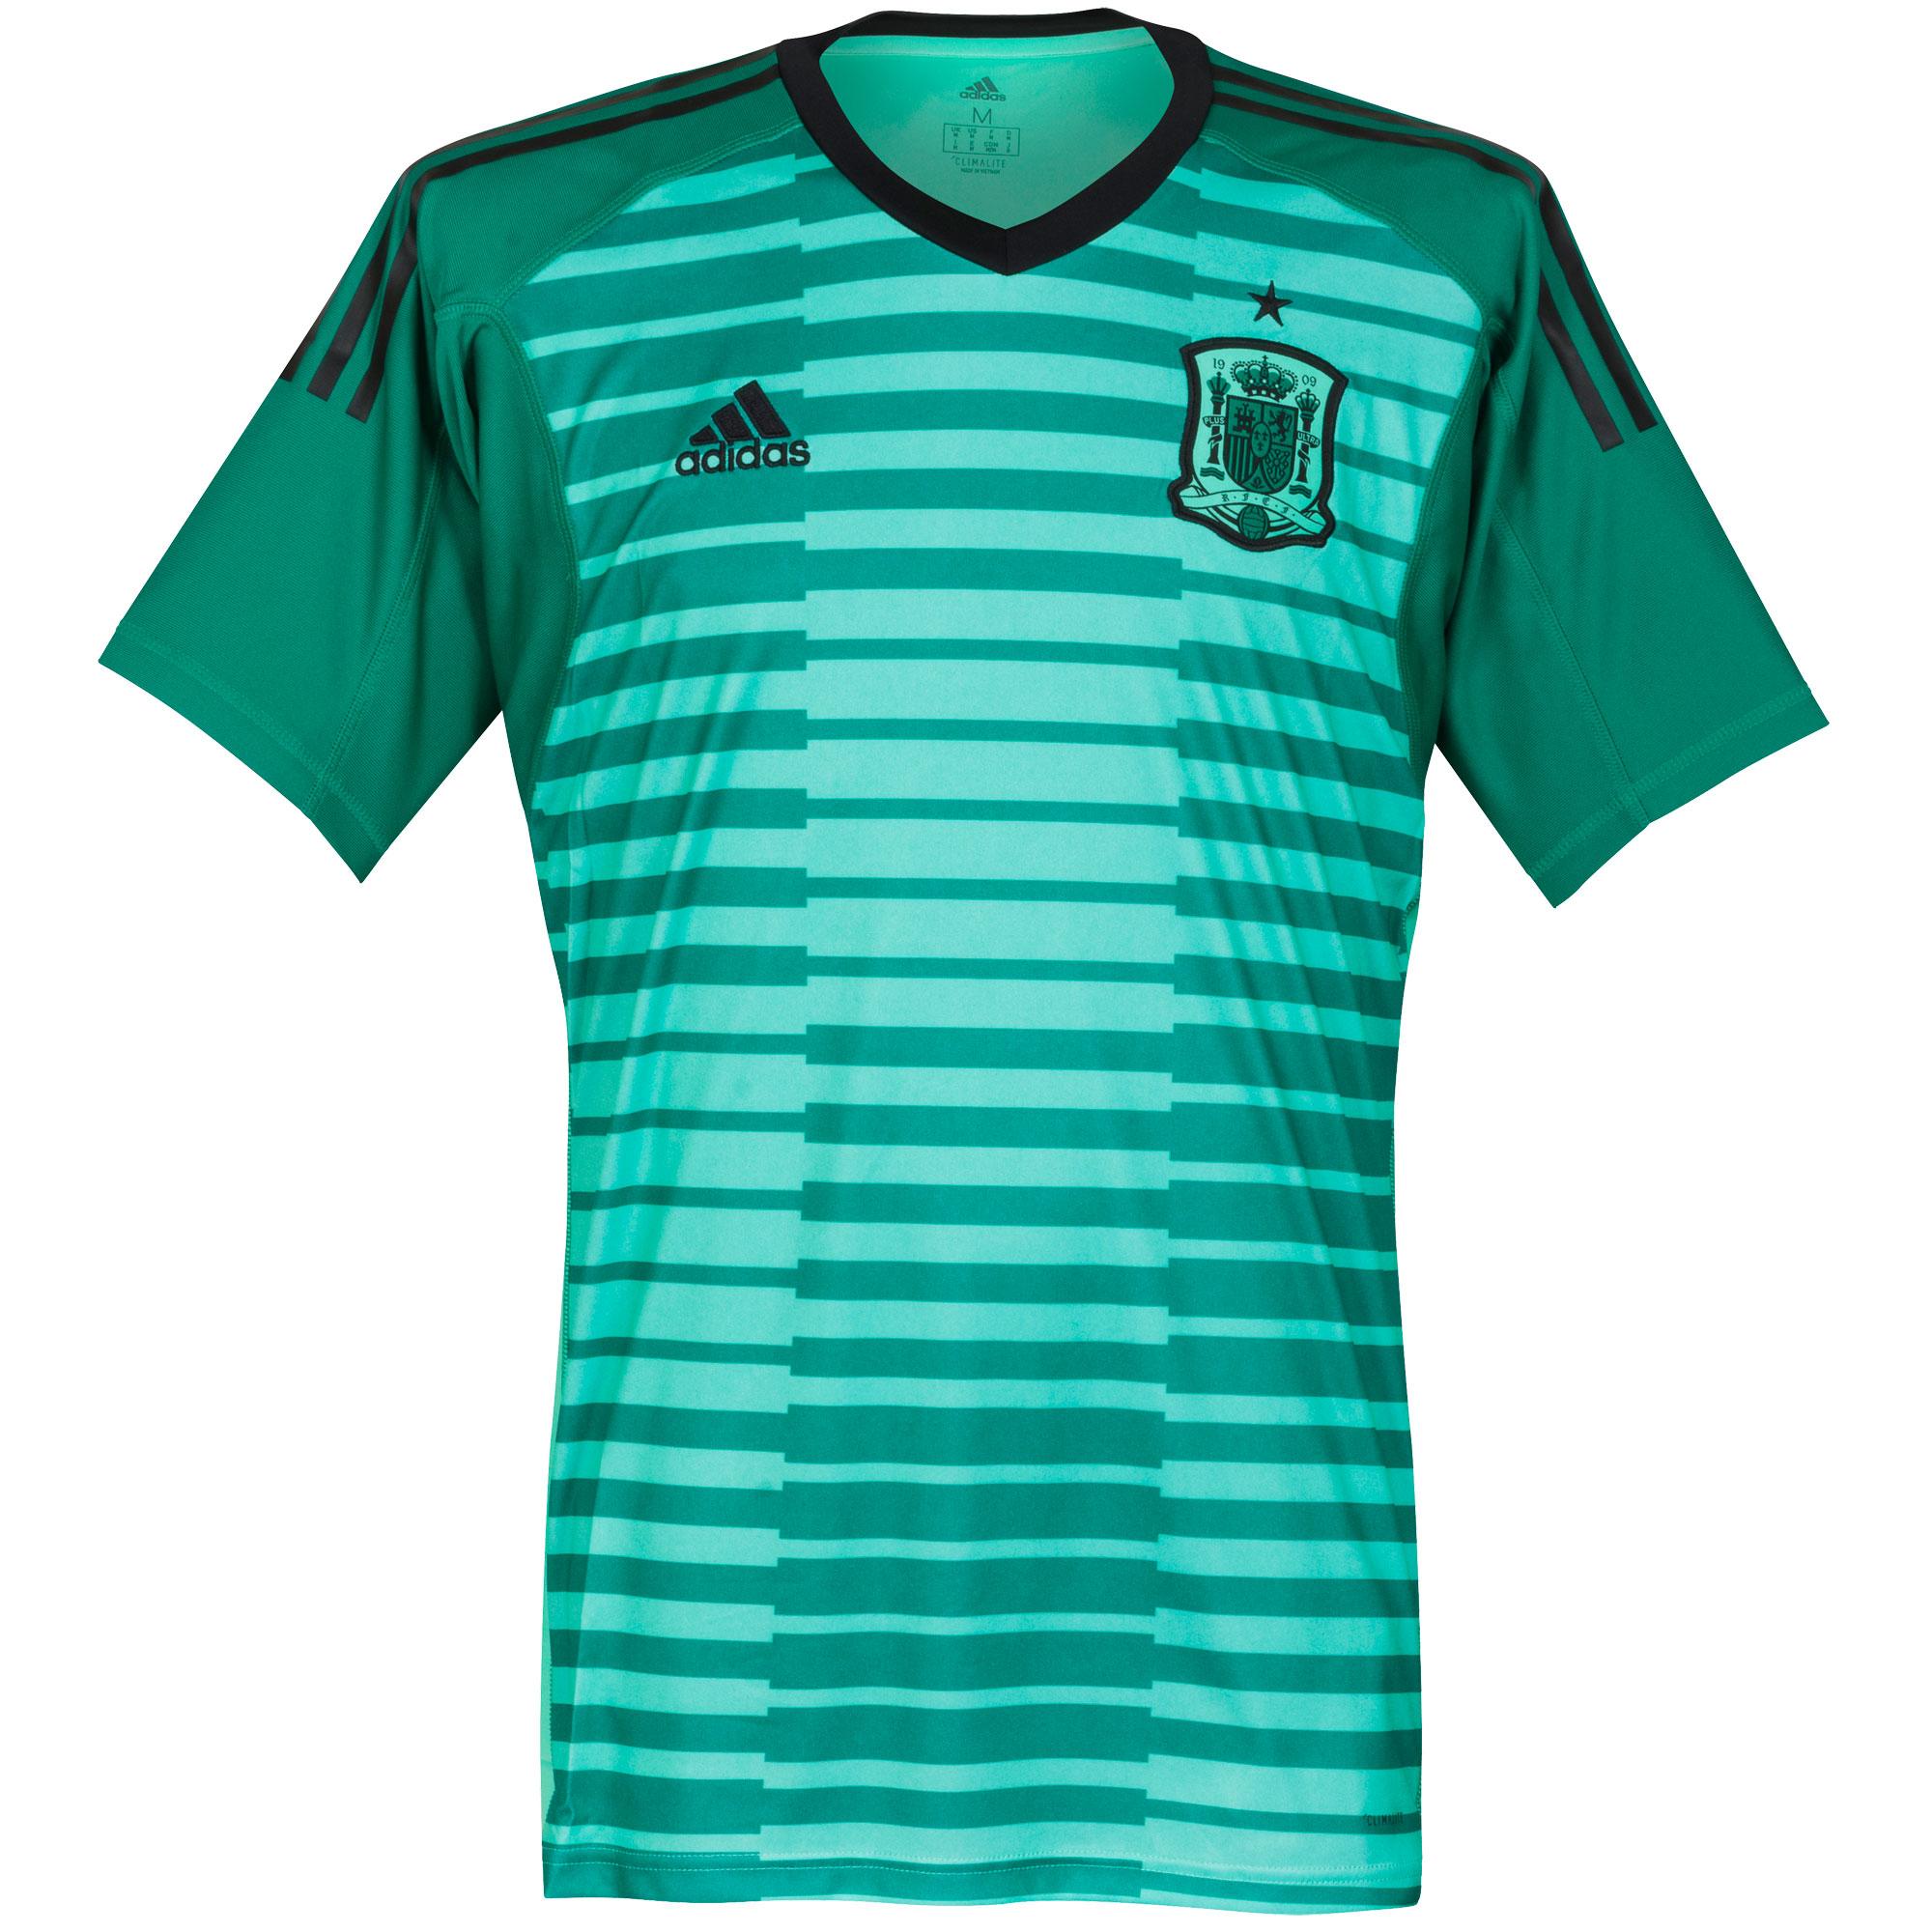 Spain Home GK Shirt 2018 2019